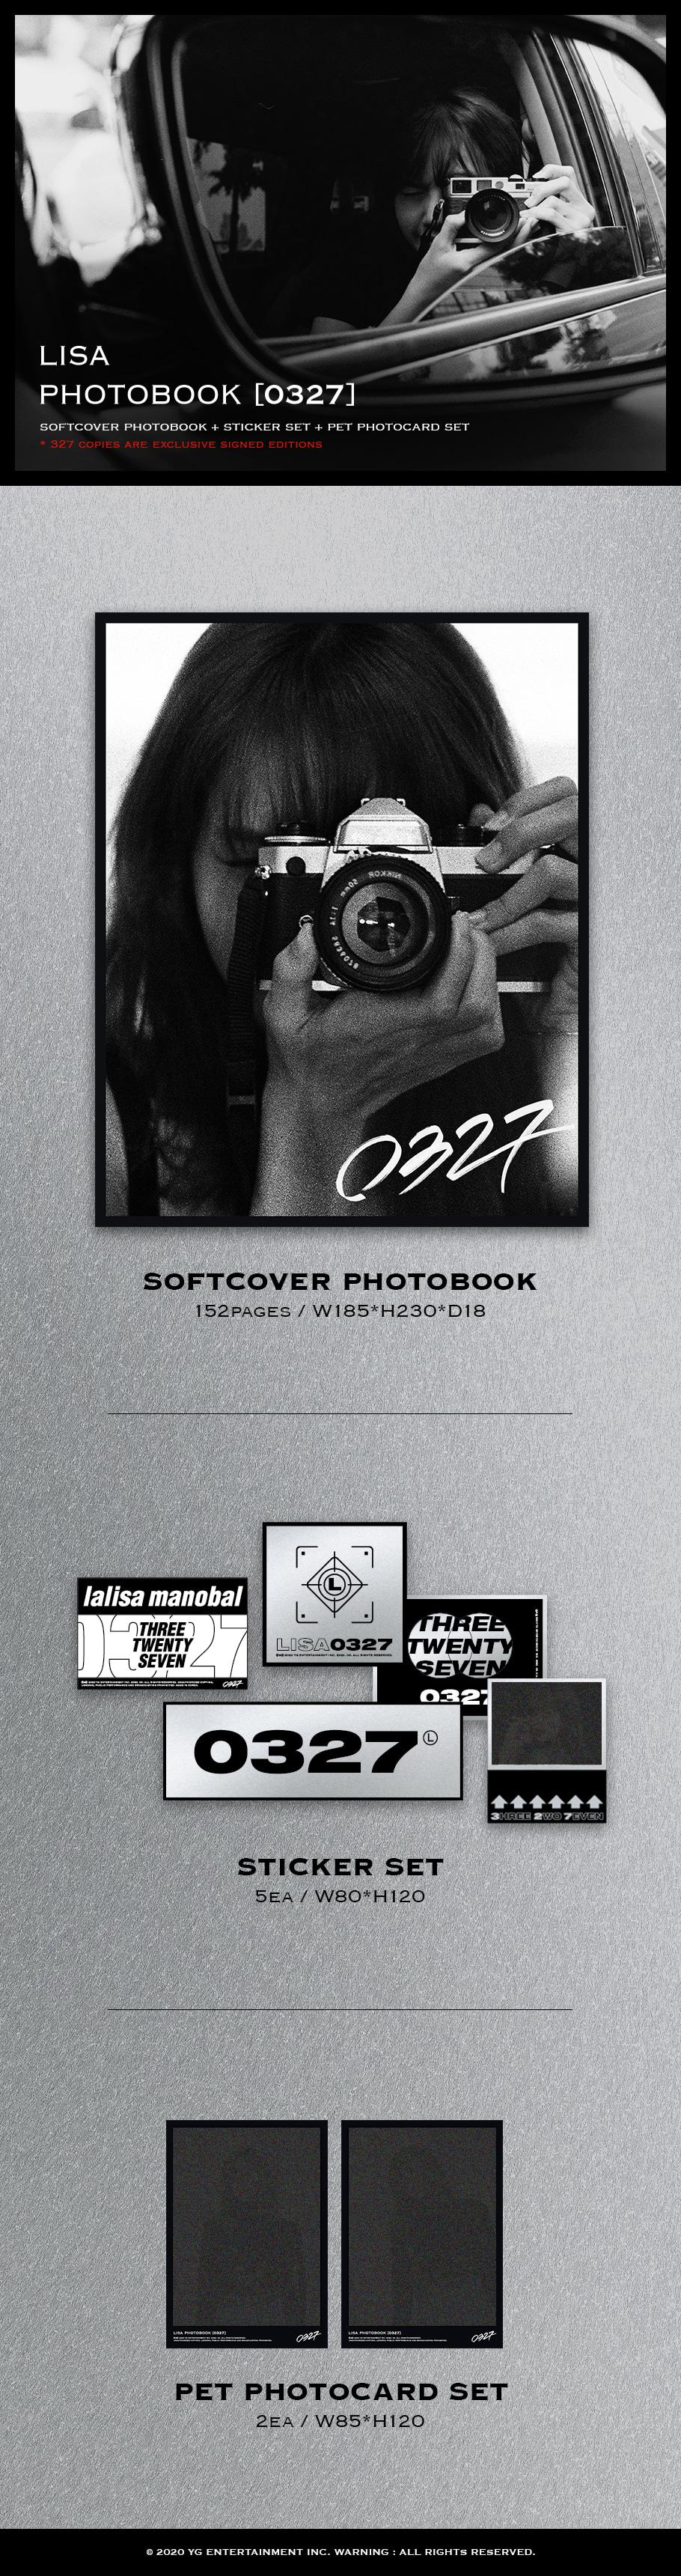 LISA PHOTOBOOK [0327] -LIMITED EDITION